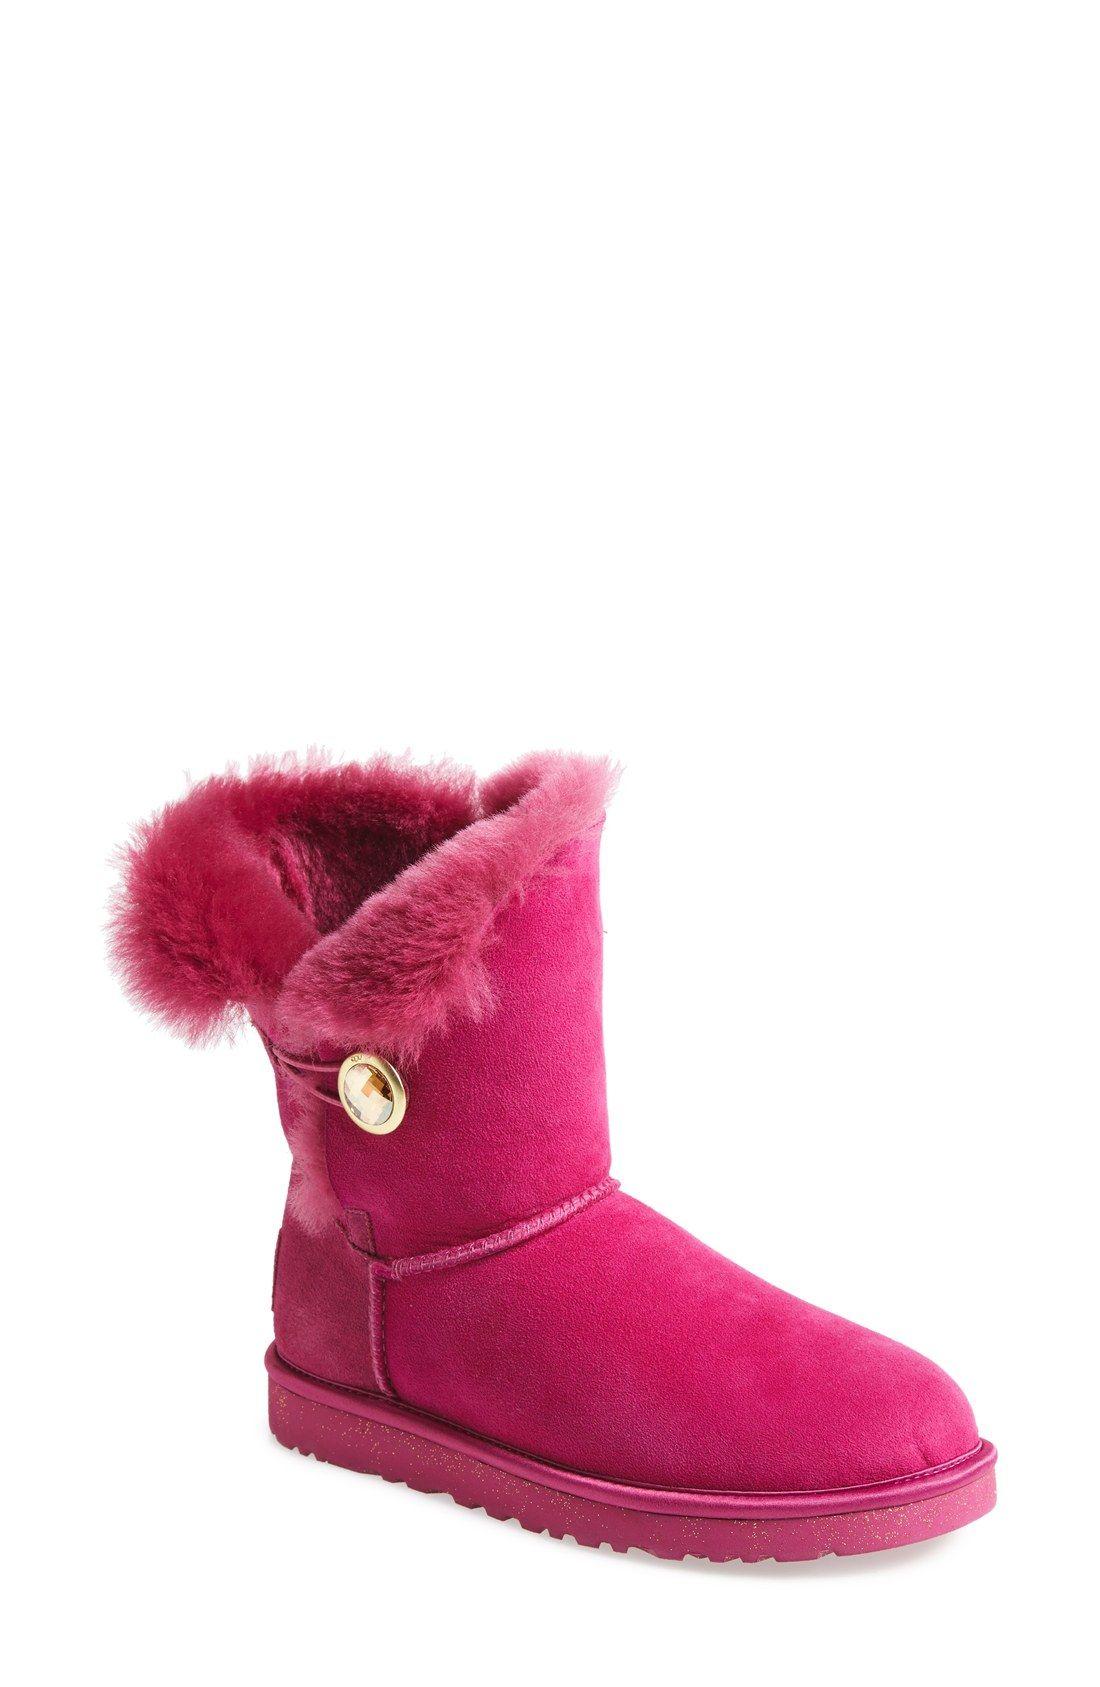 0564741bfe8 UGG® Australia 'Bailey Button - Ornate' Boot (Women) | Fall/Winter ...